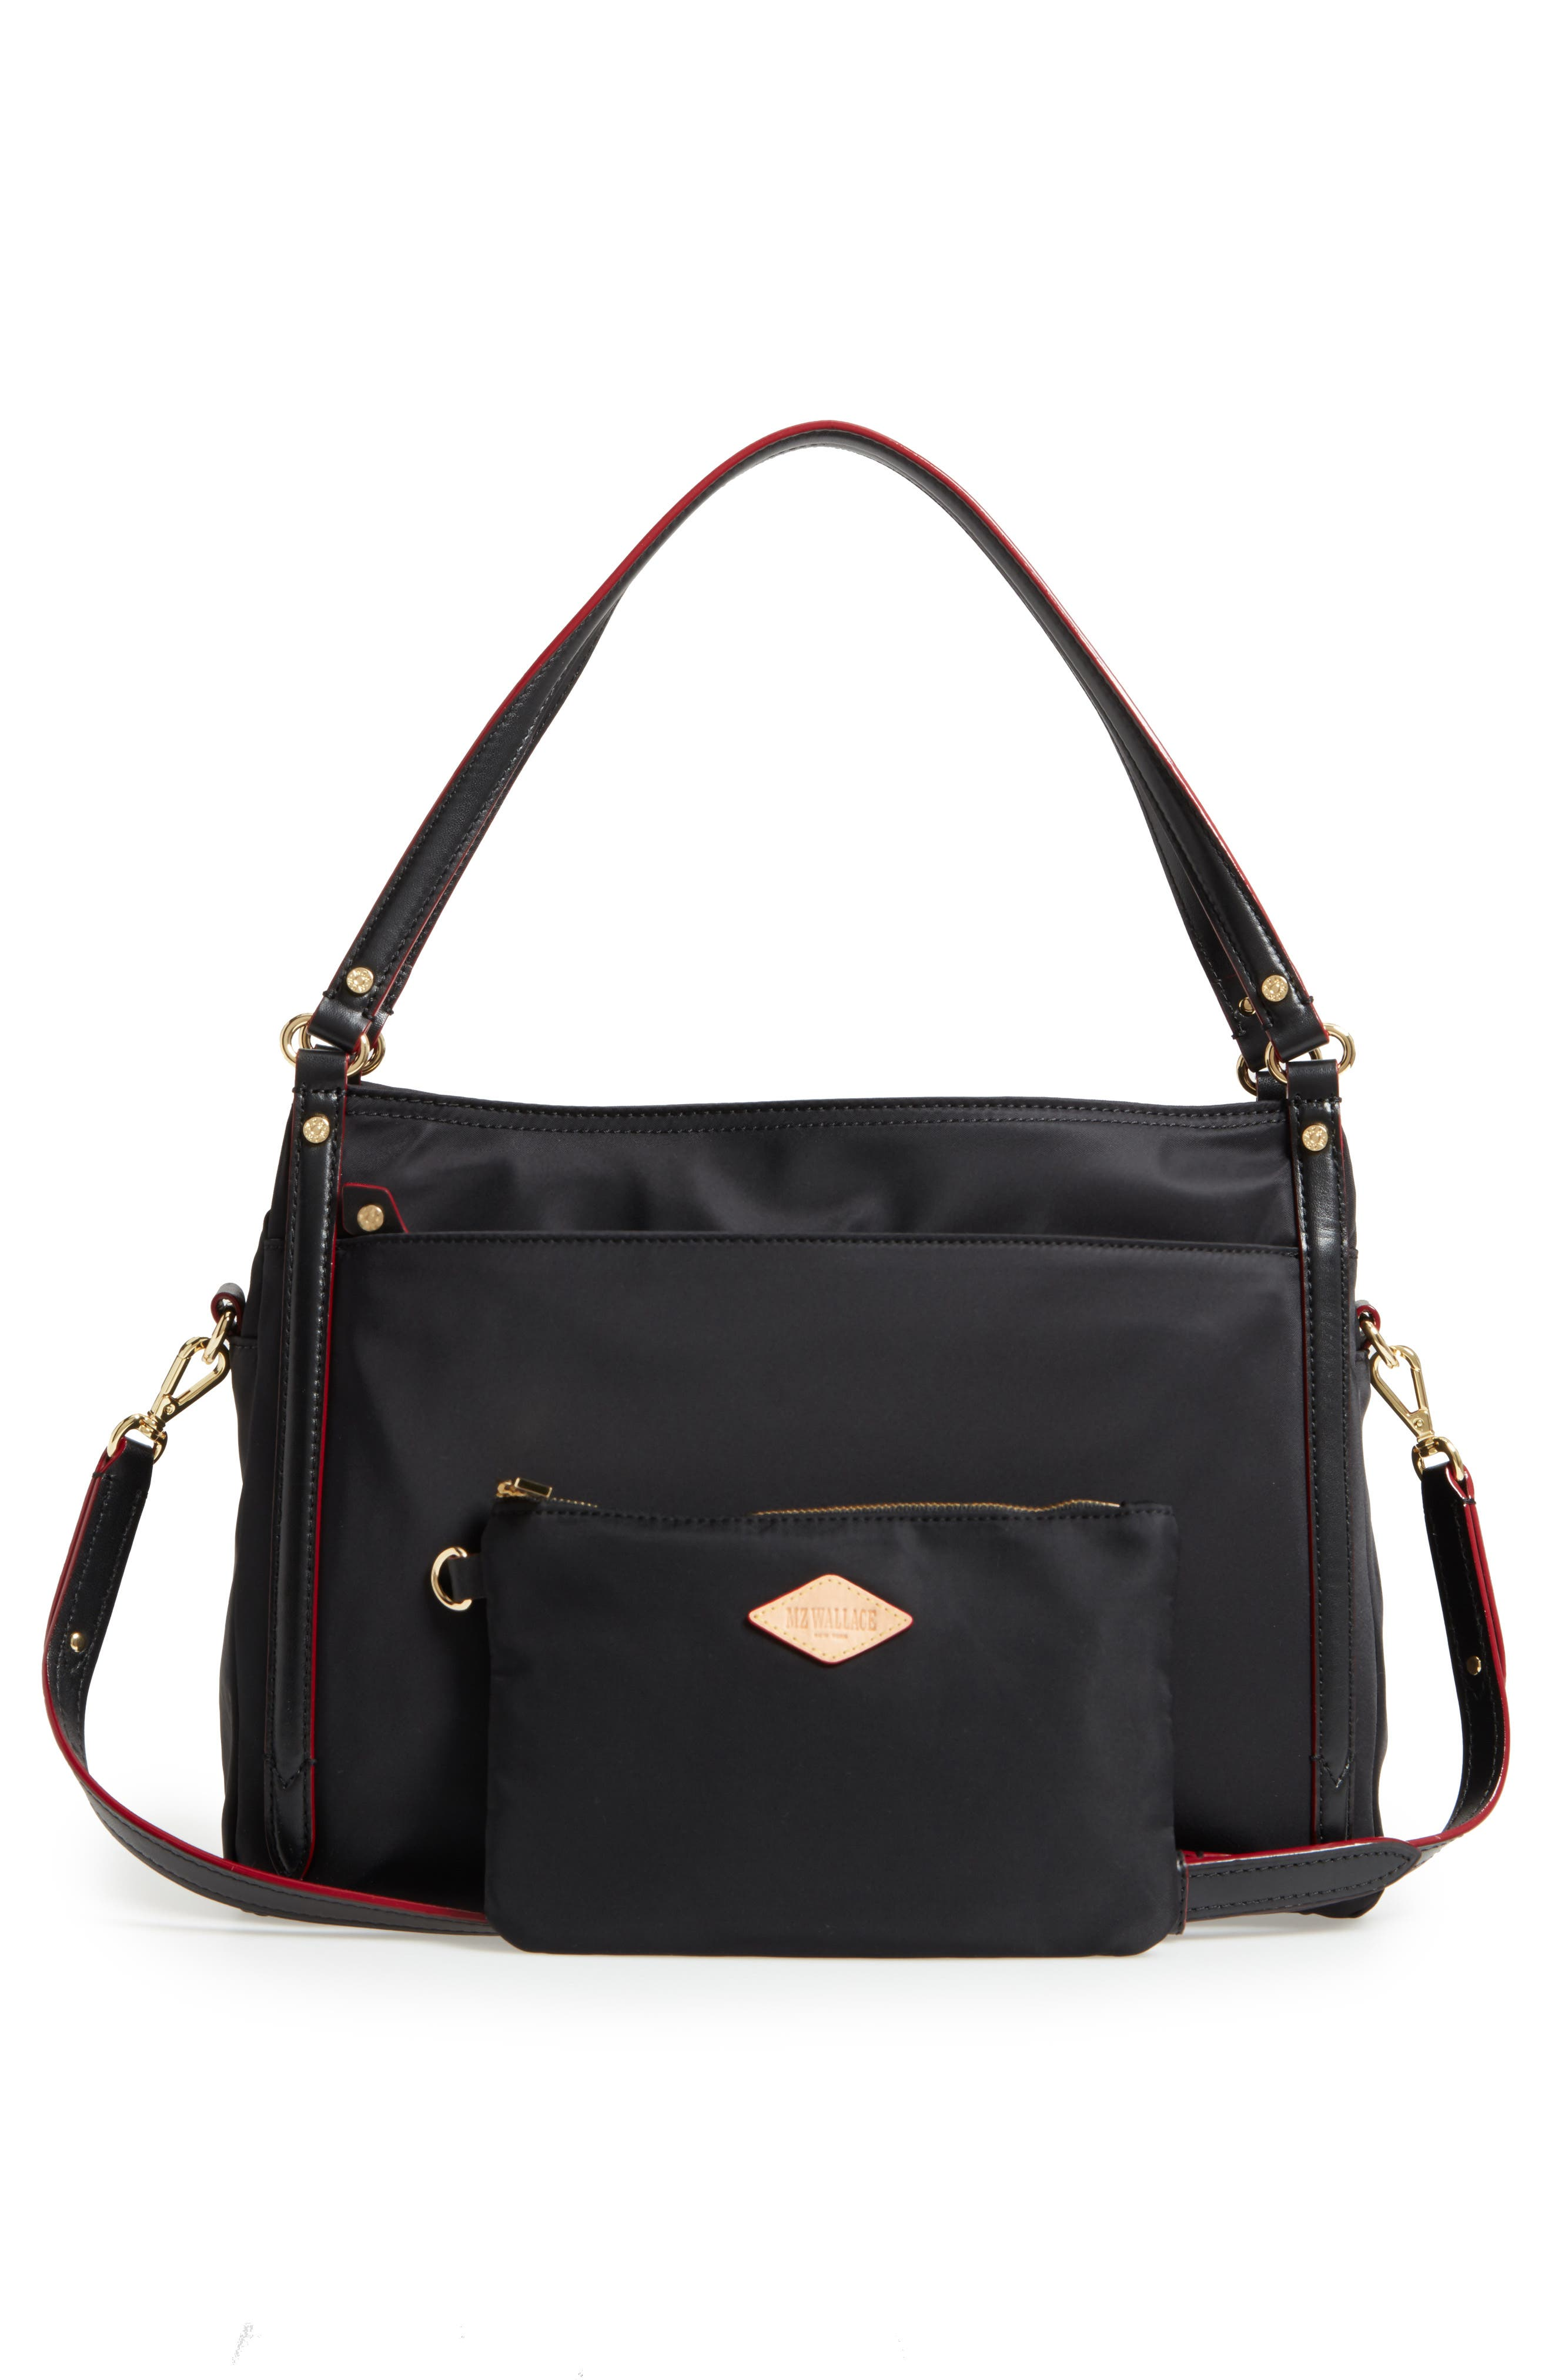 Main Image - MZ Wallace Toni Bedford Nylon Shoulder Bag